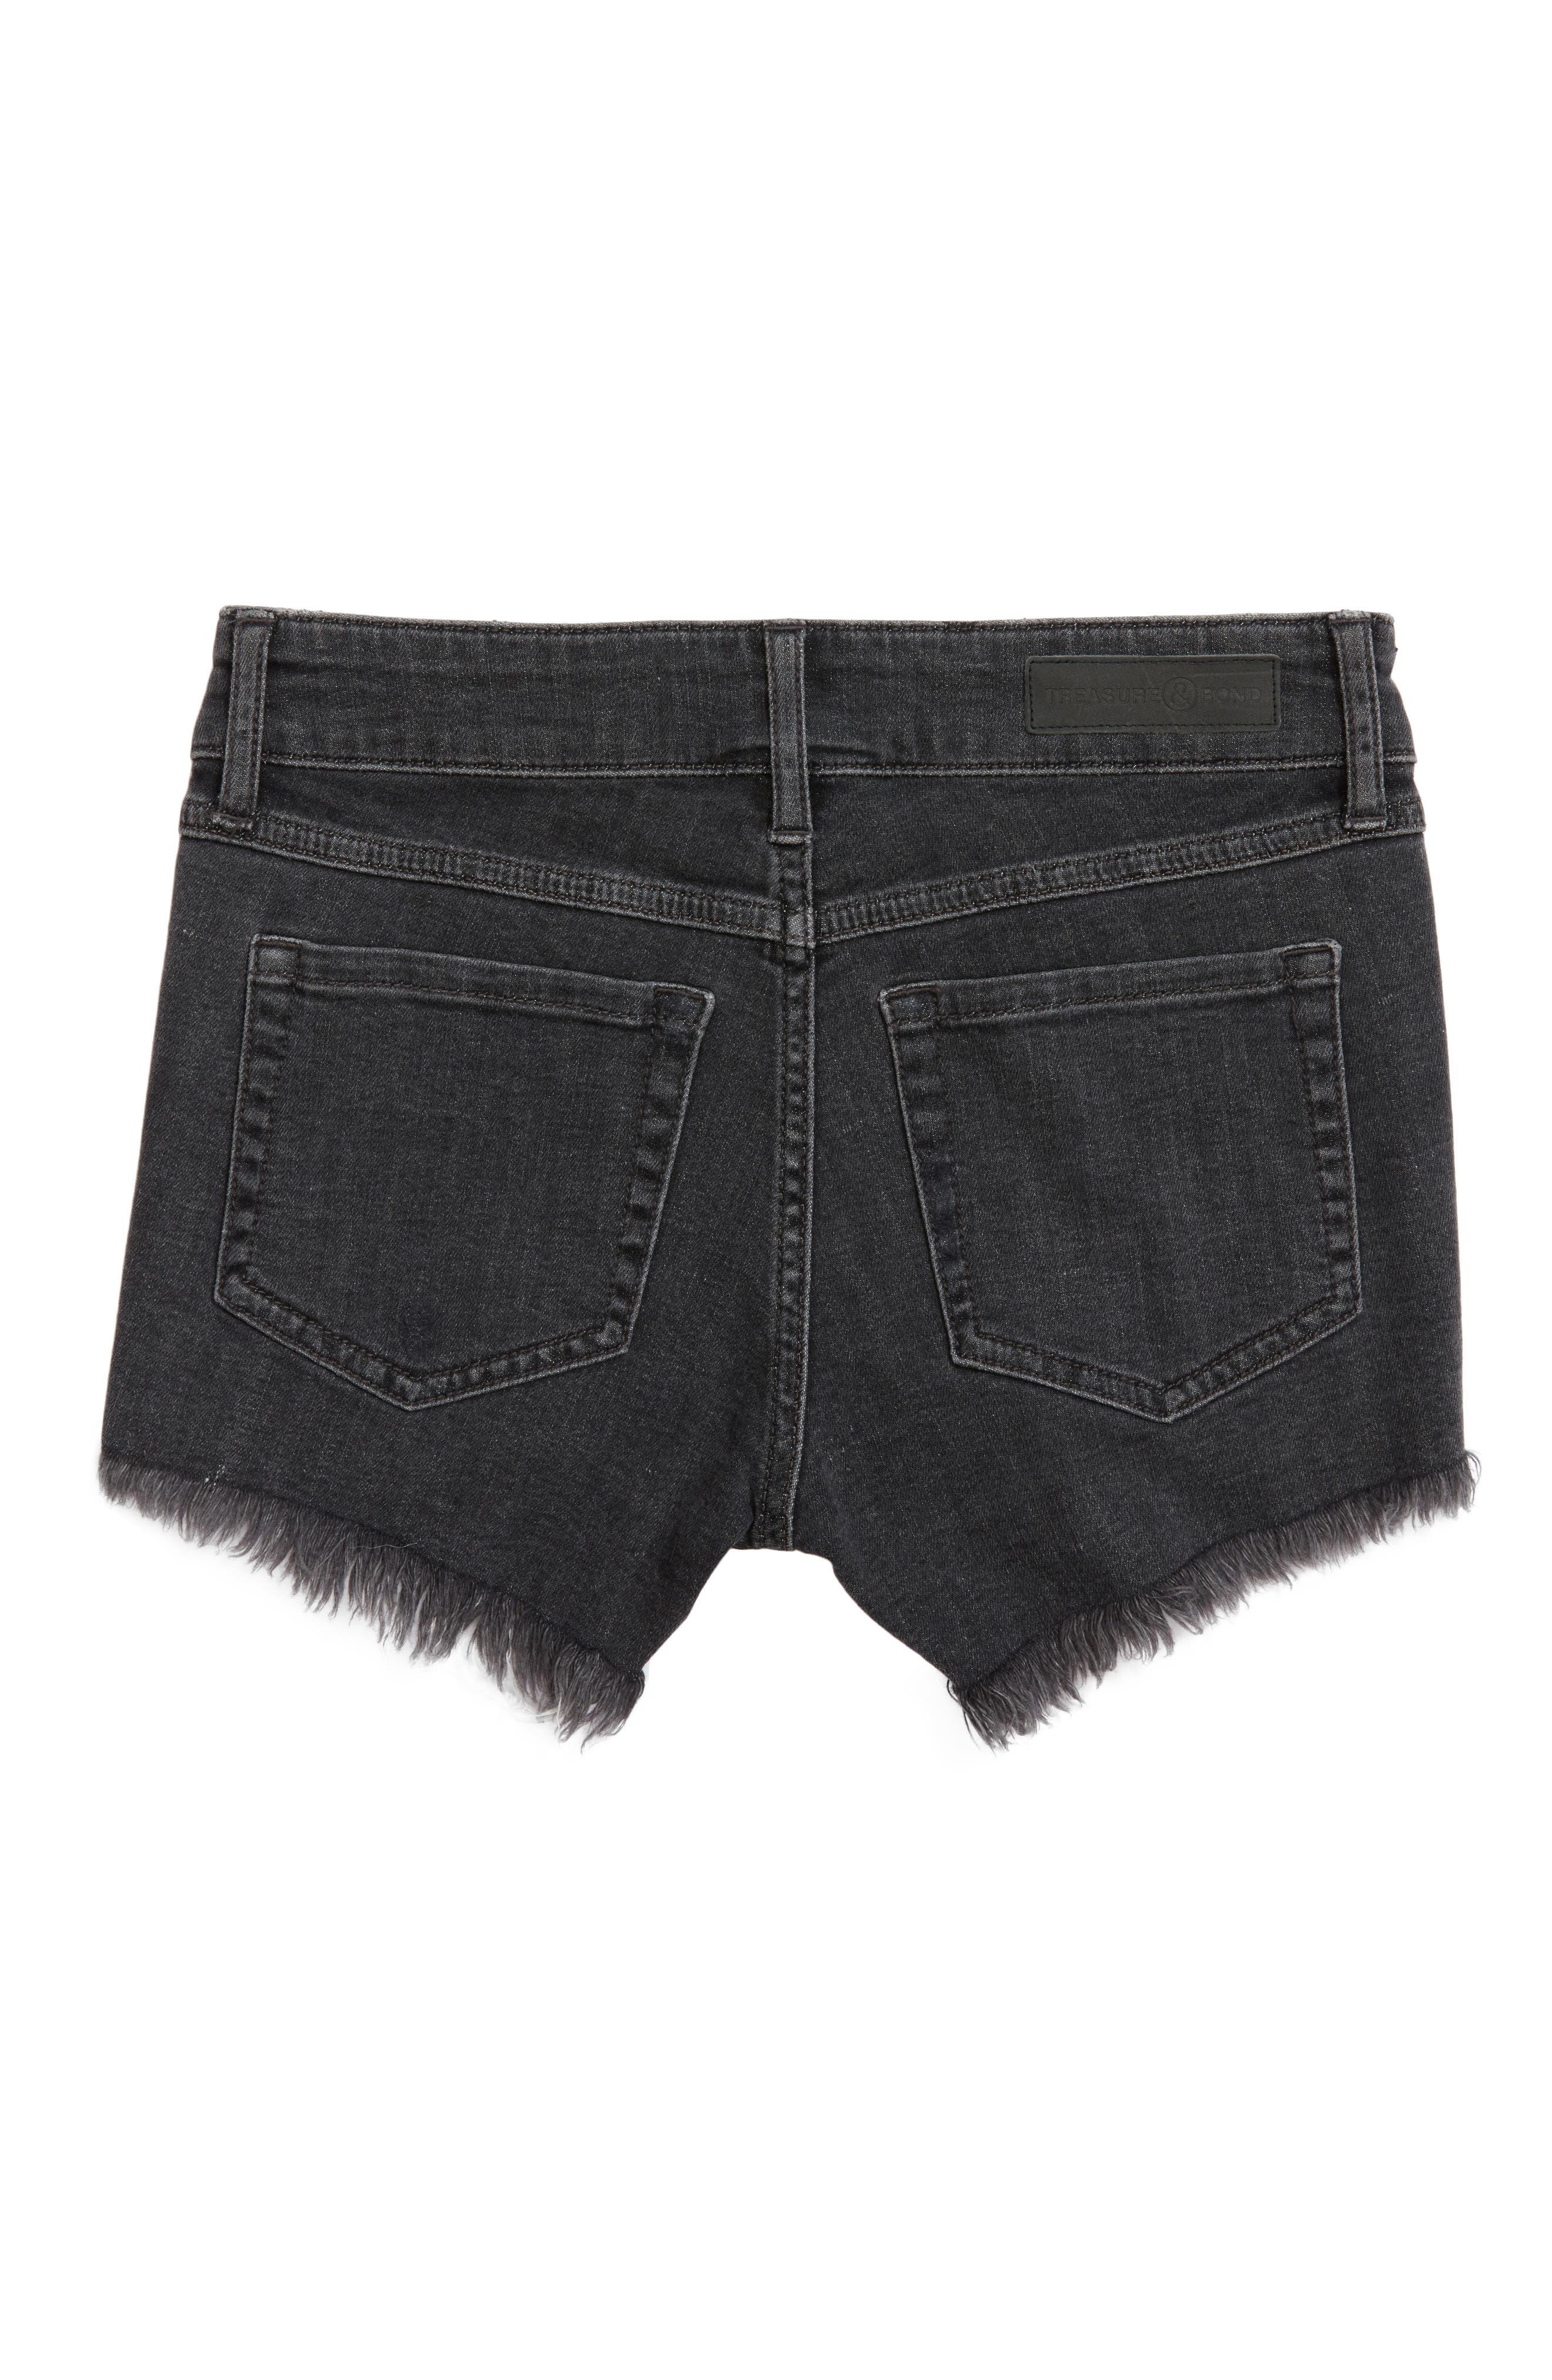 Distressed Cutoff Denim Shorts,                             Alternate thumbnail 2, color,                             Black Vintage Wash